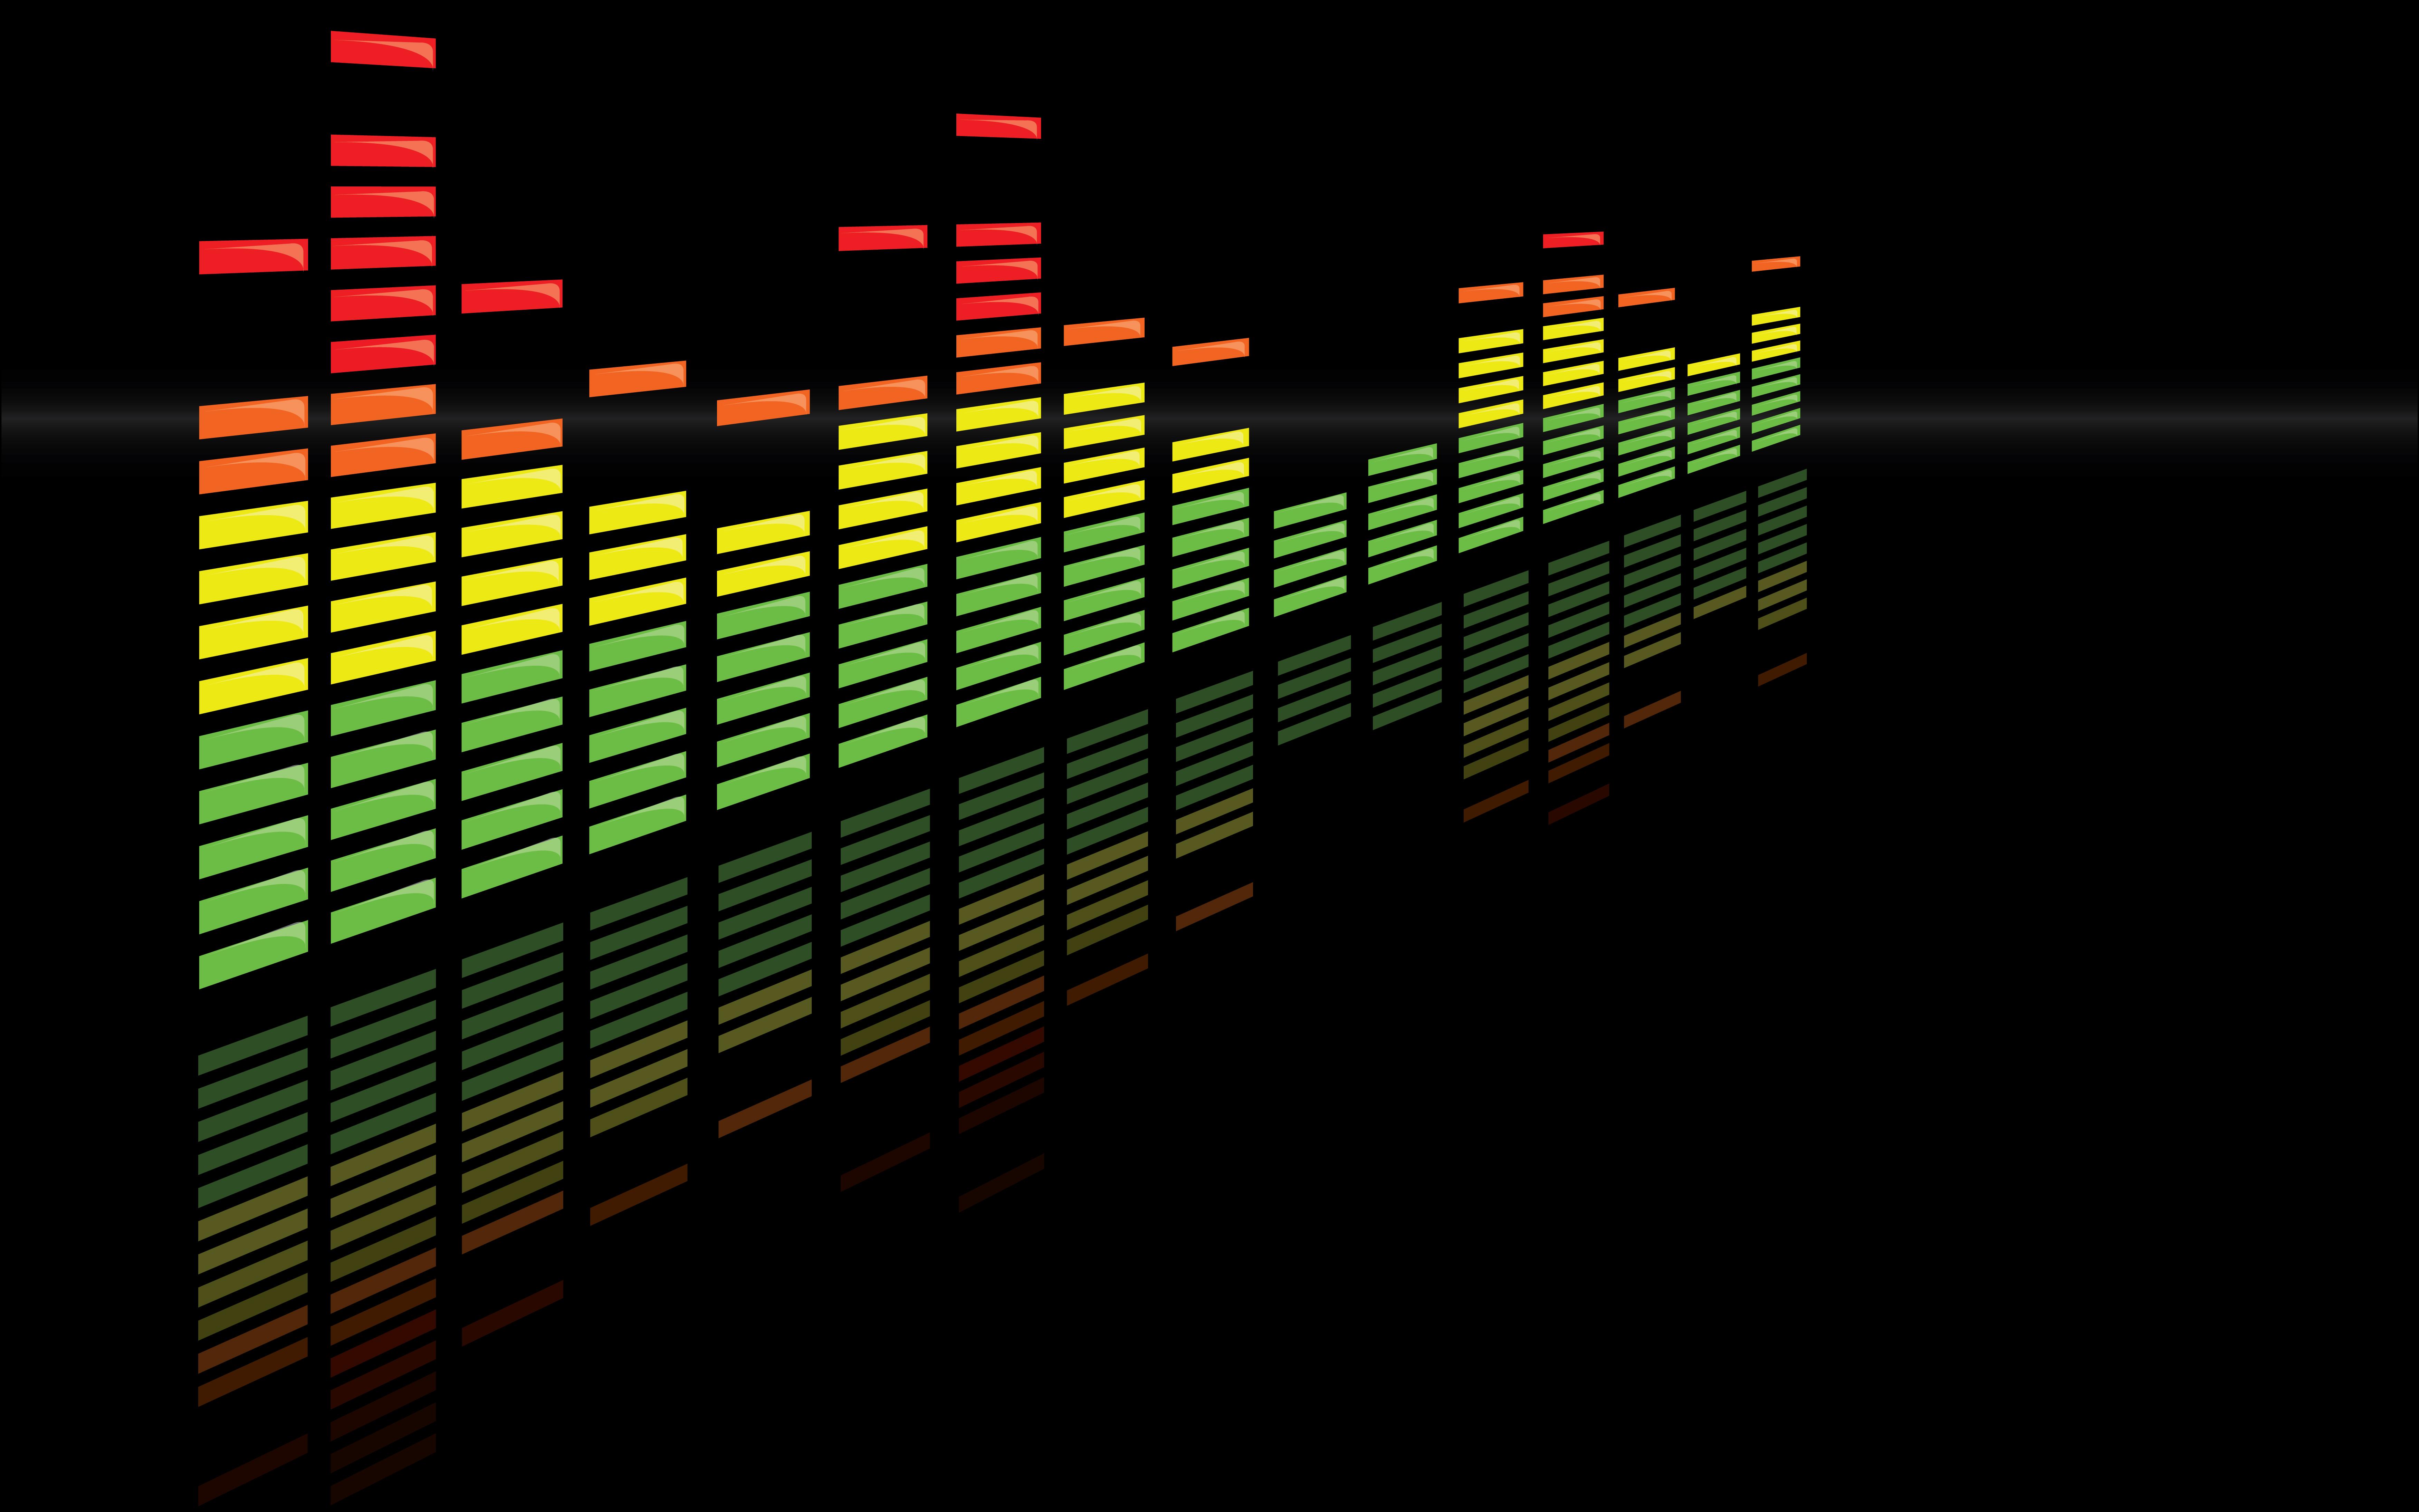 Dj Music Wallpapers HD Music Desktop Backgrounds   Follow Us On 7004x4379